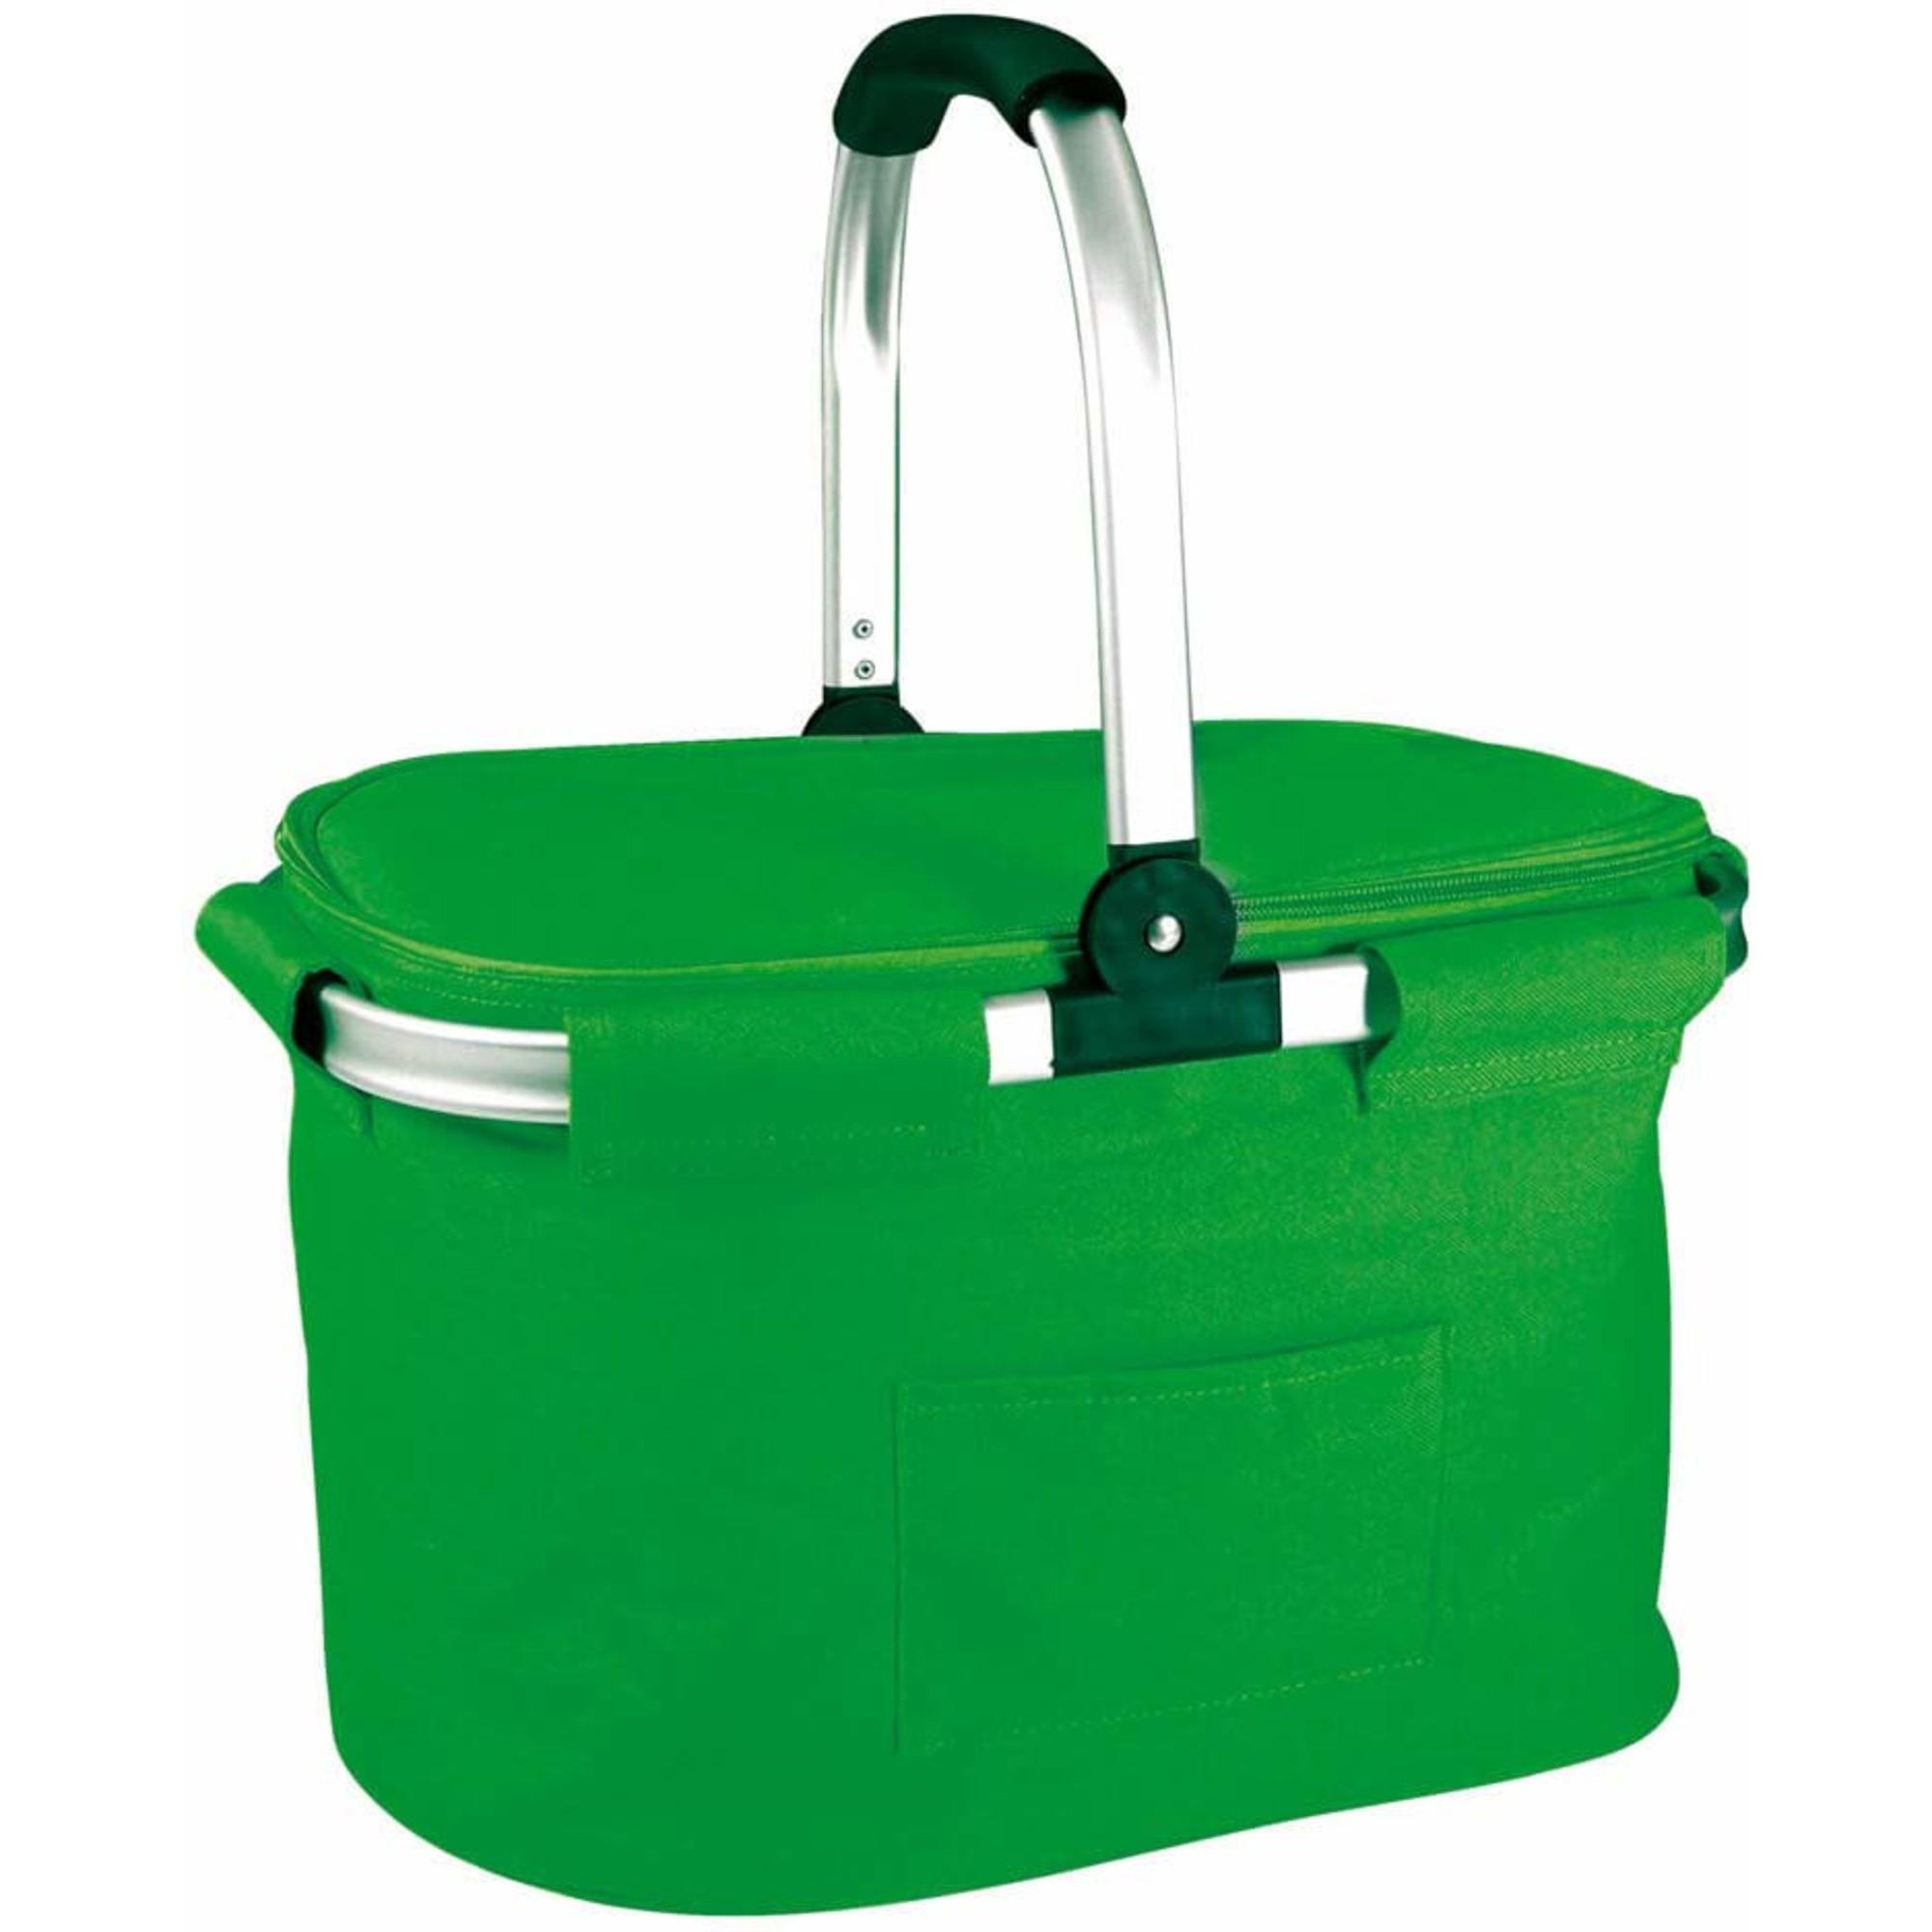 Bercato Kylväska Cooler Basket Grön